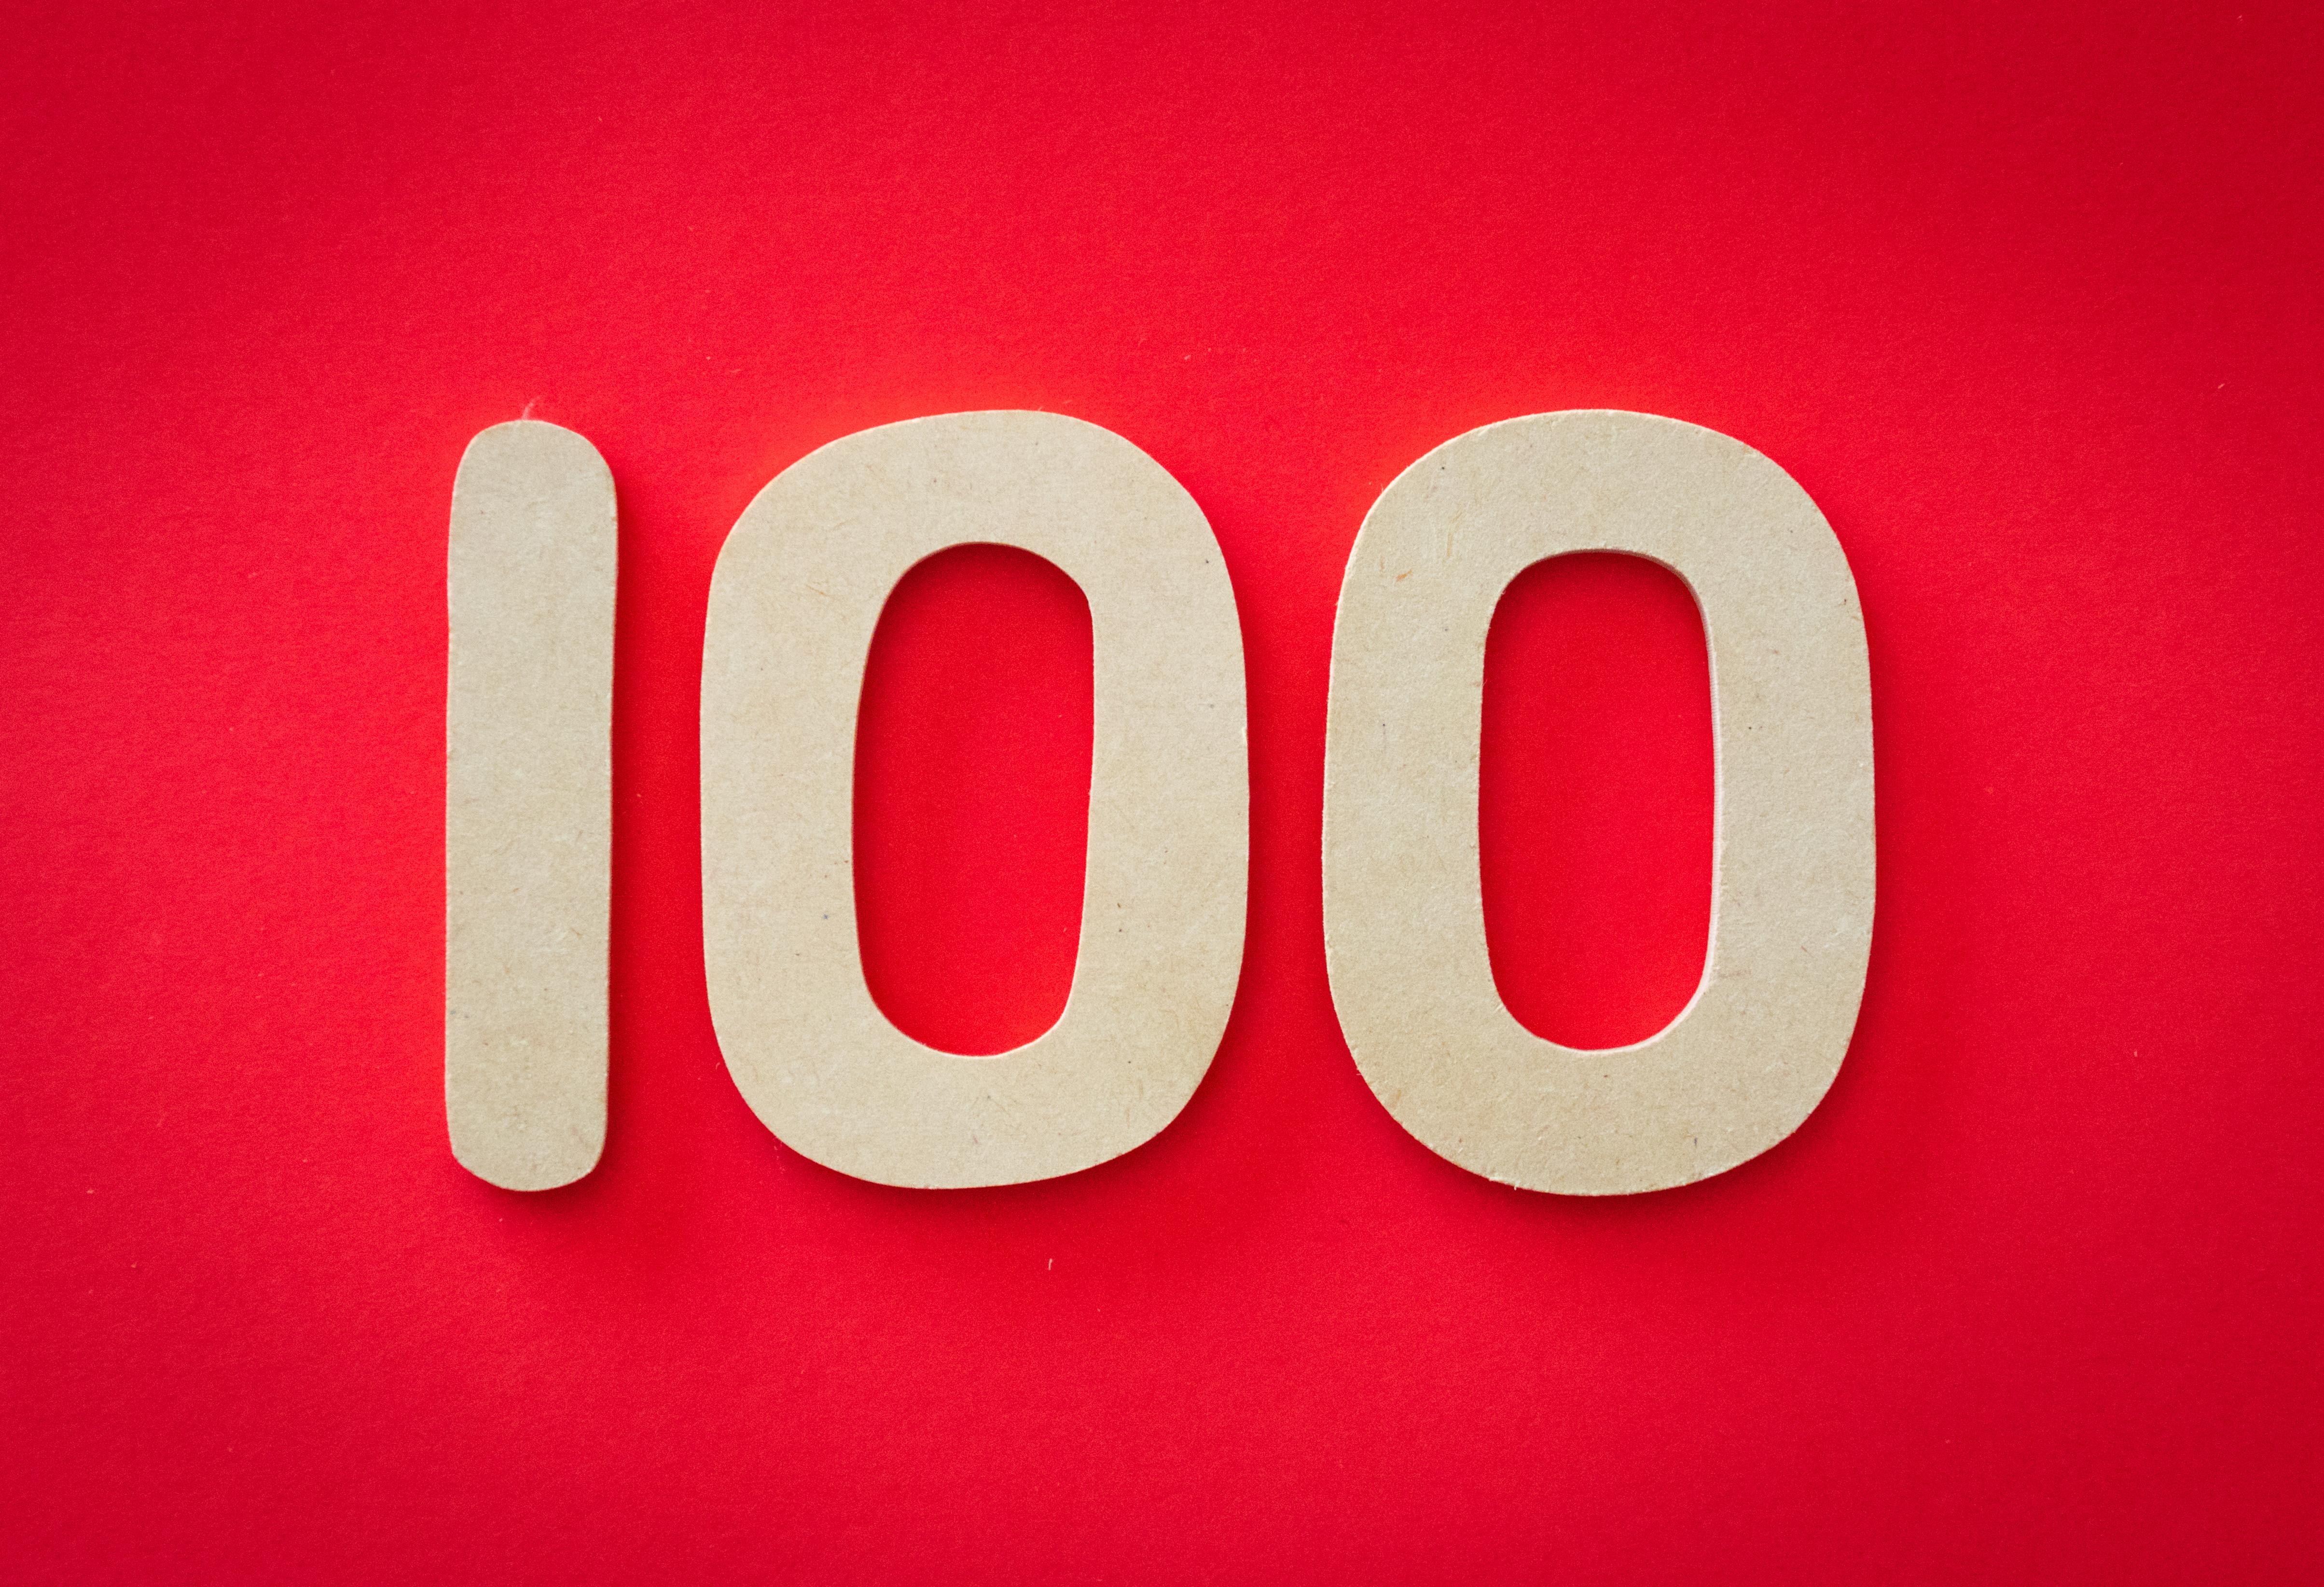 The 100 Day Program